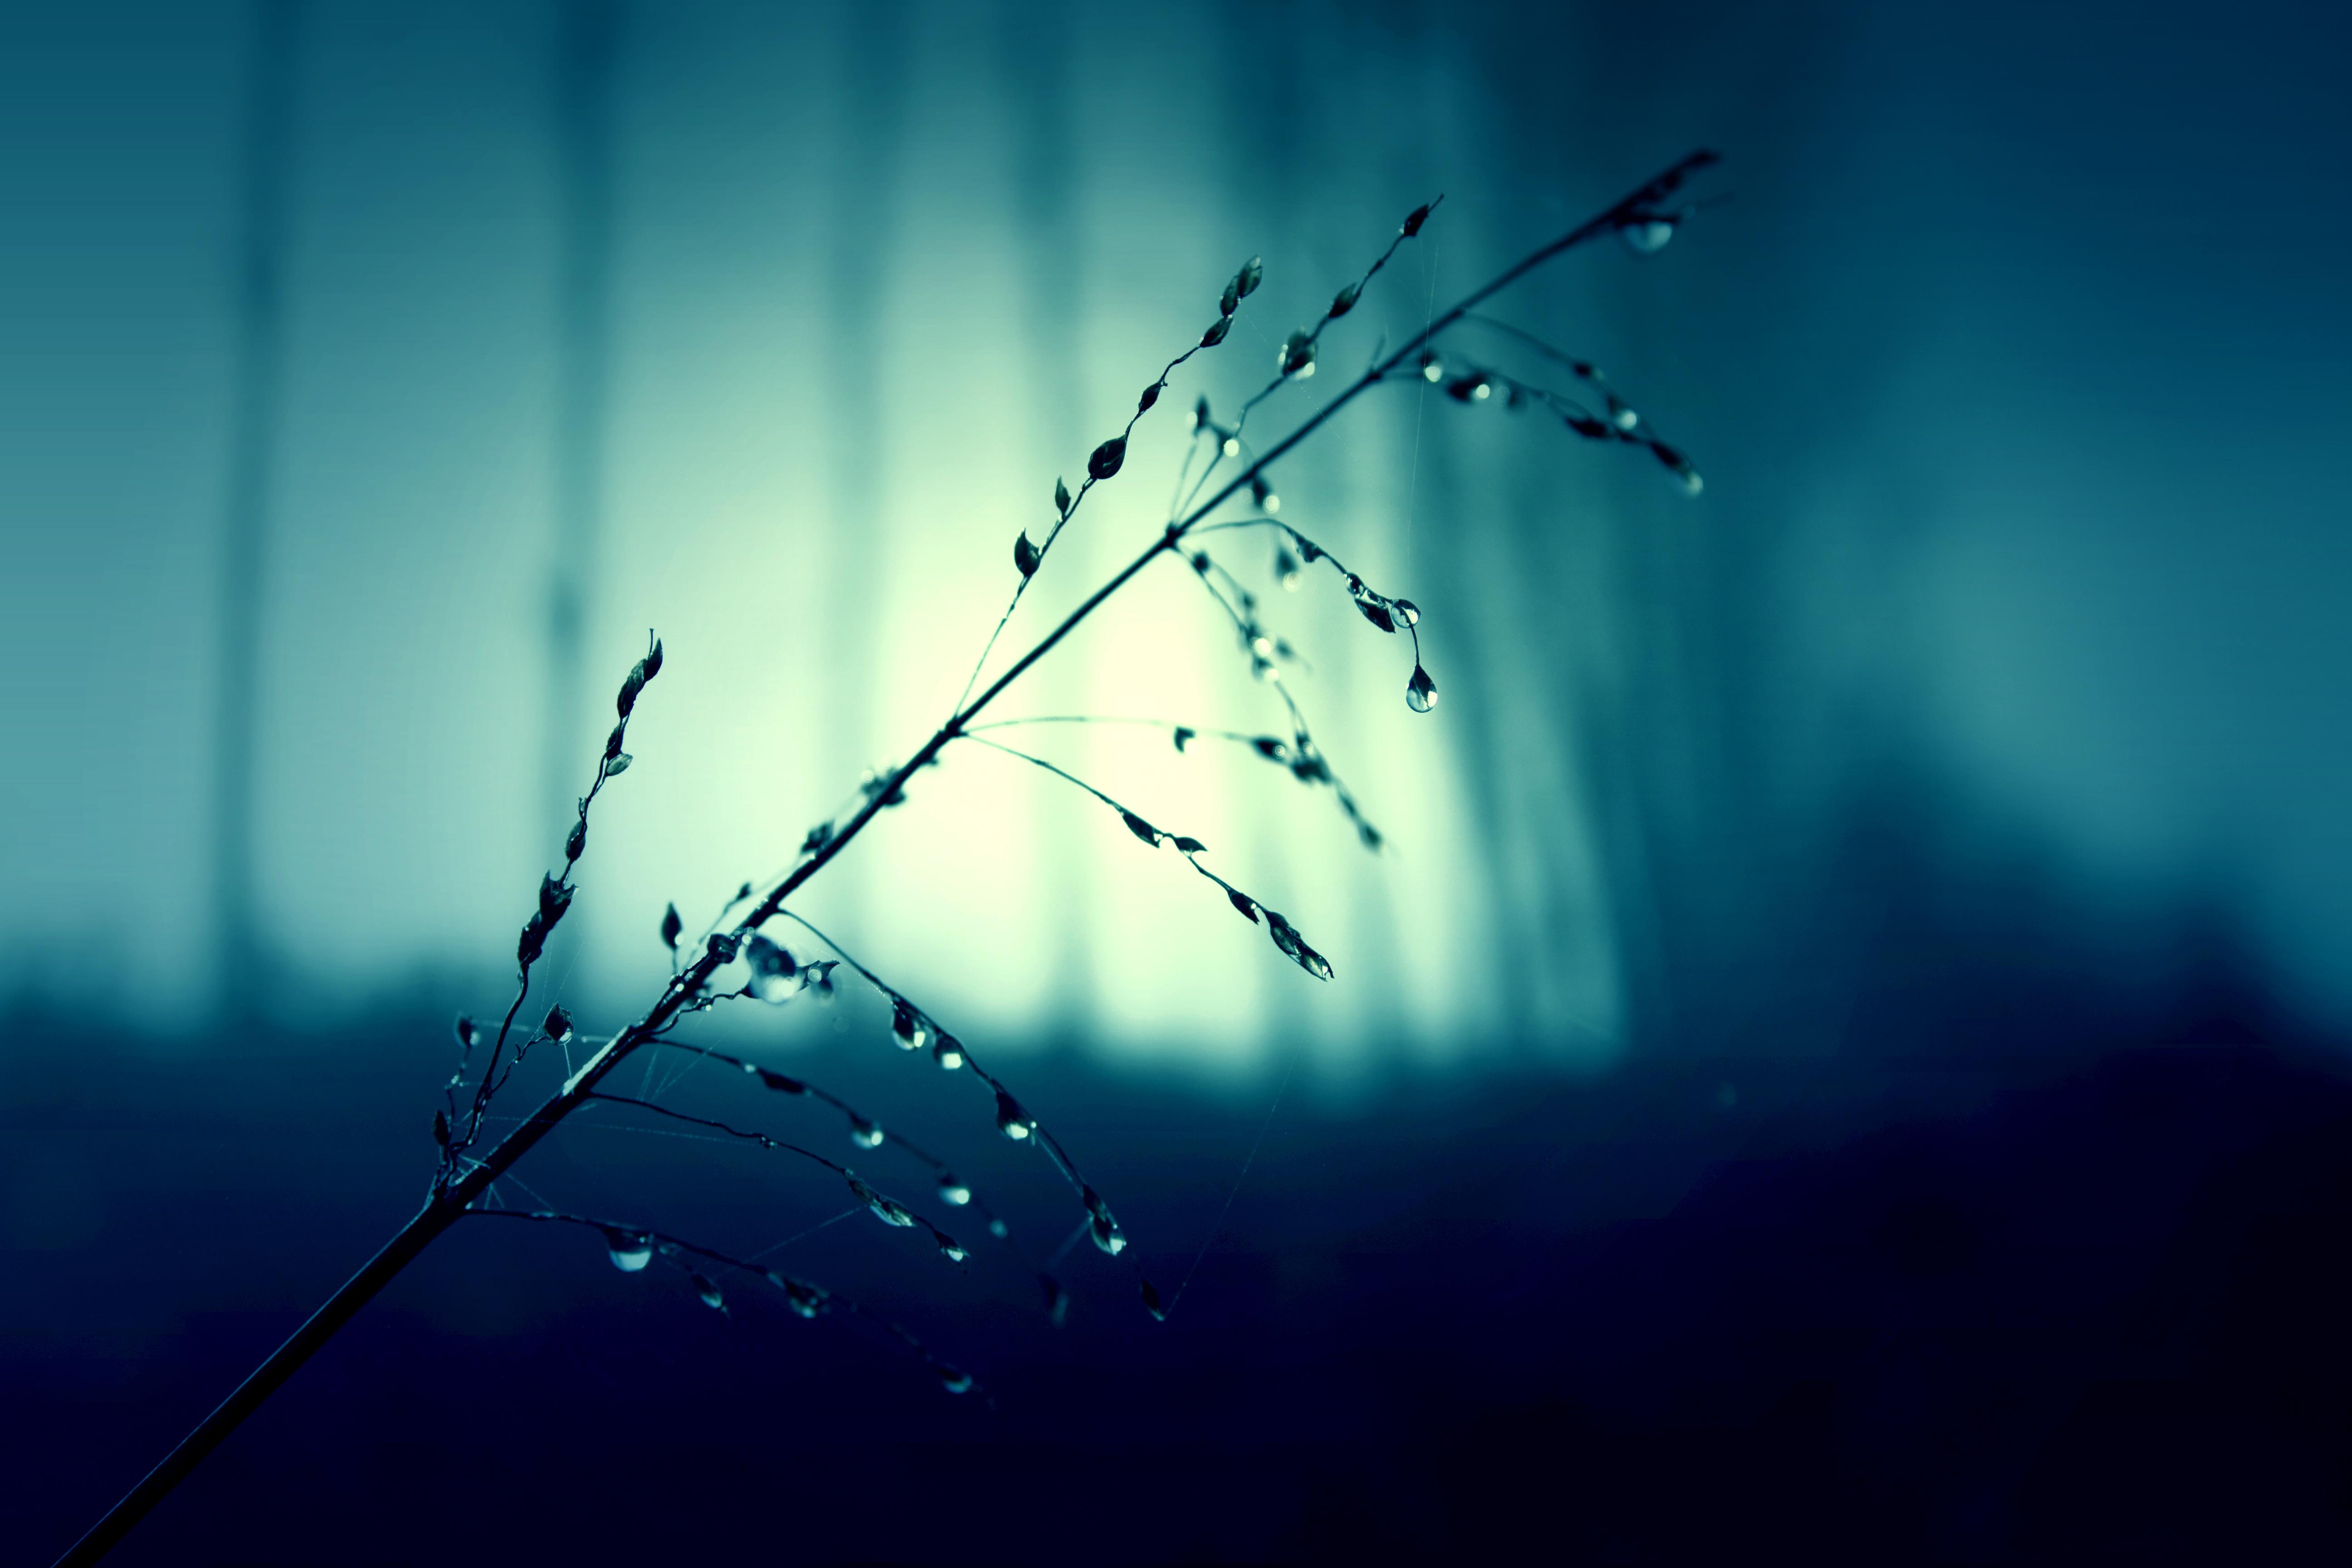 Free Images Branch Light Sunlight Rain Leaf Wave Flower Line Green Reflection Color Darkness Blue Electricity Rainy Raindrops Shape